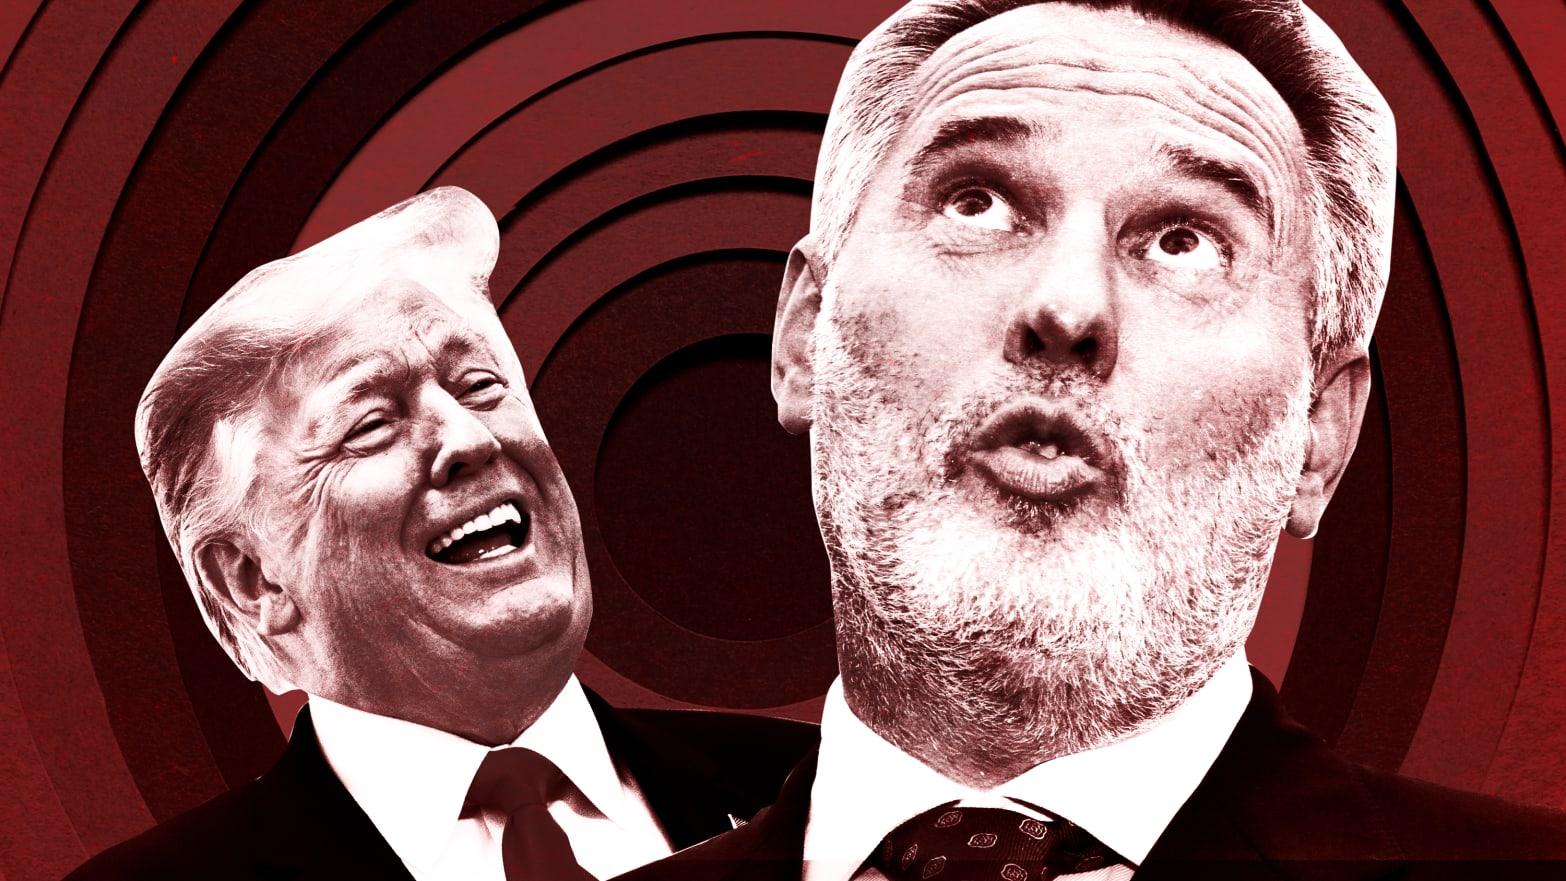 Indicted Oligarch Dmytro Firtash Praises Paul Manafort, Says Trump Has Third-Grade Smarts